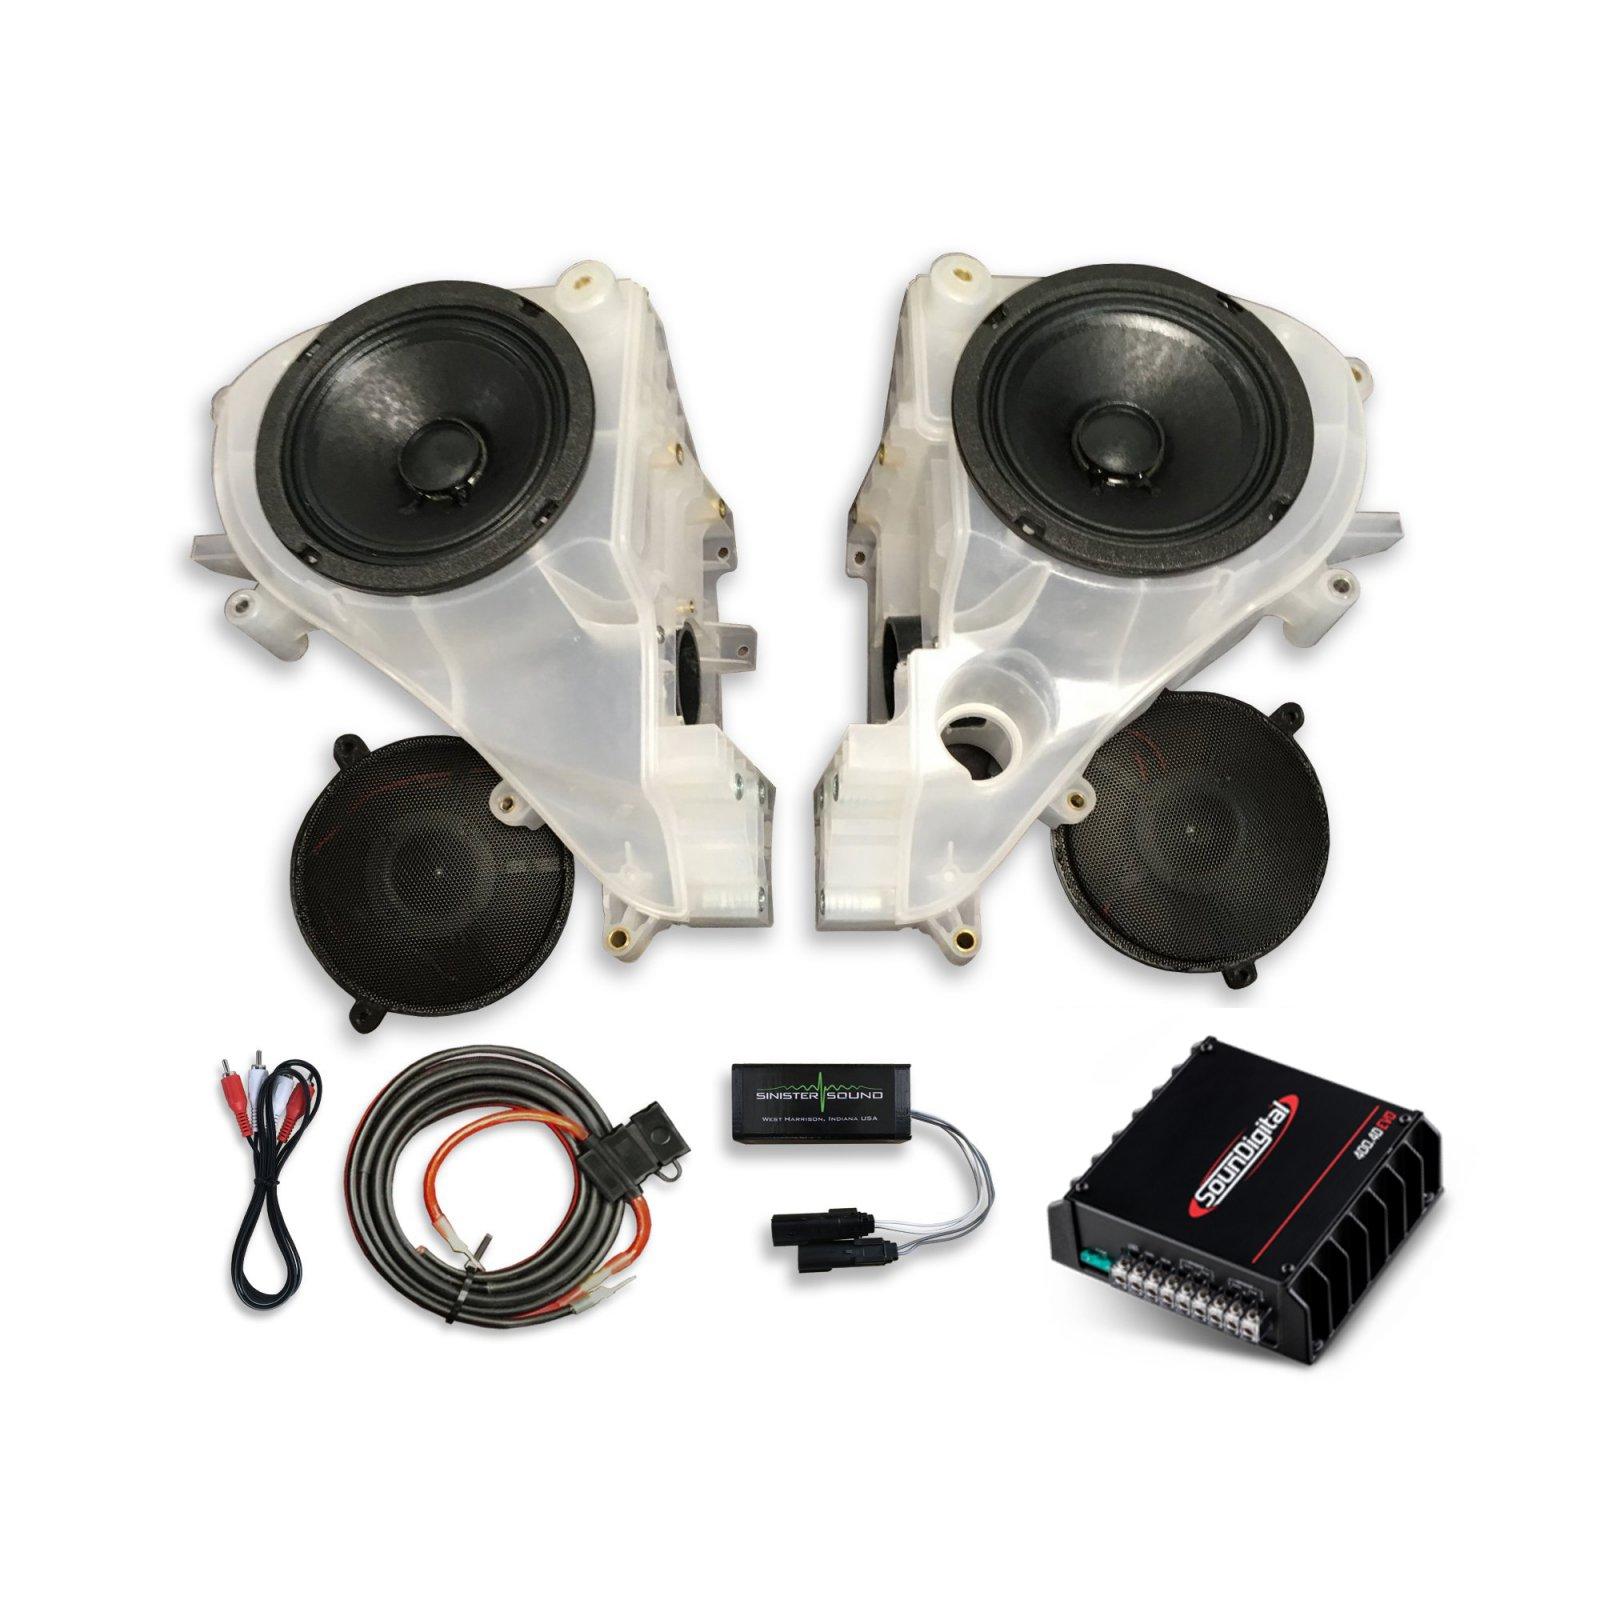 14-18 Street Glide SinisterSound Fairing System with Sound Digital